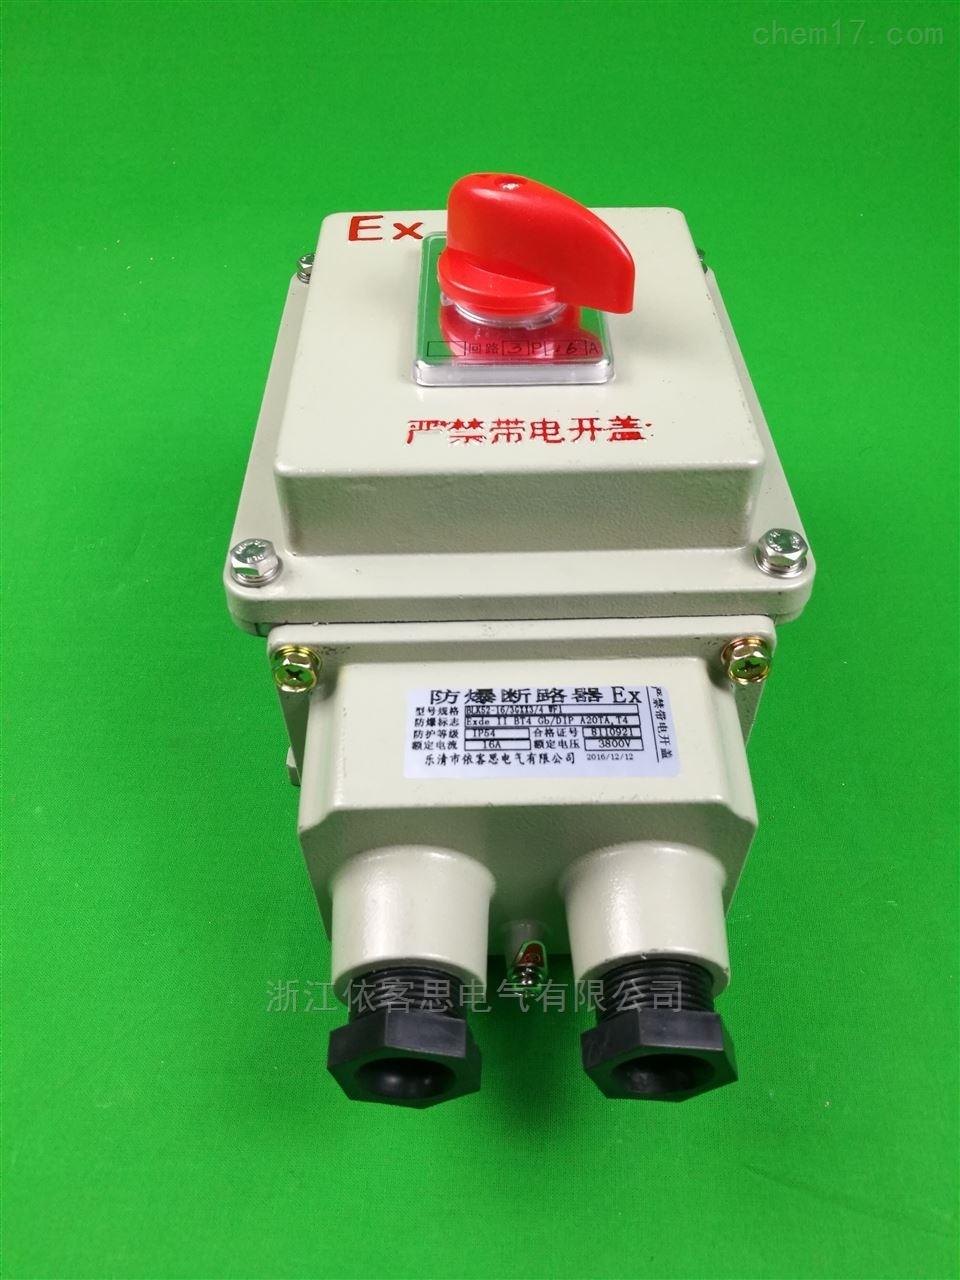 LA133-10A防水防尘转换开关IP65/10A/220V三防组合开关